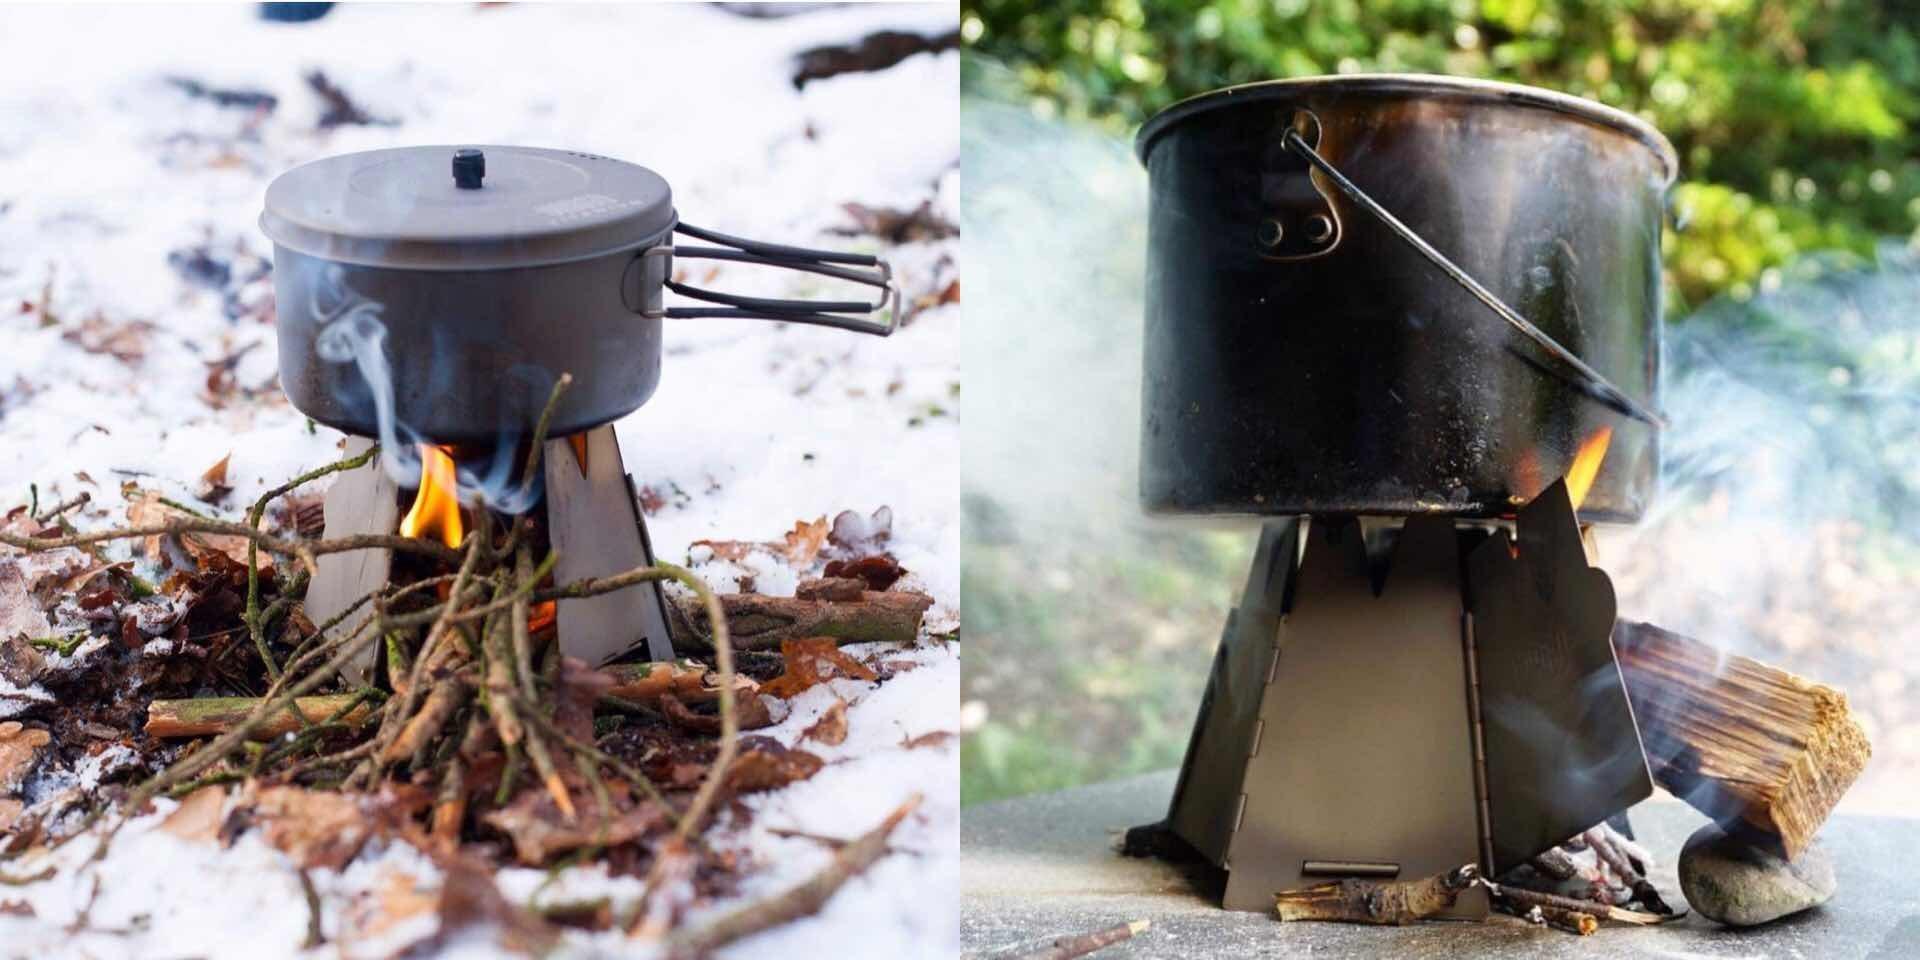 vargo-titanium-hexagon-wood-stove-2